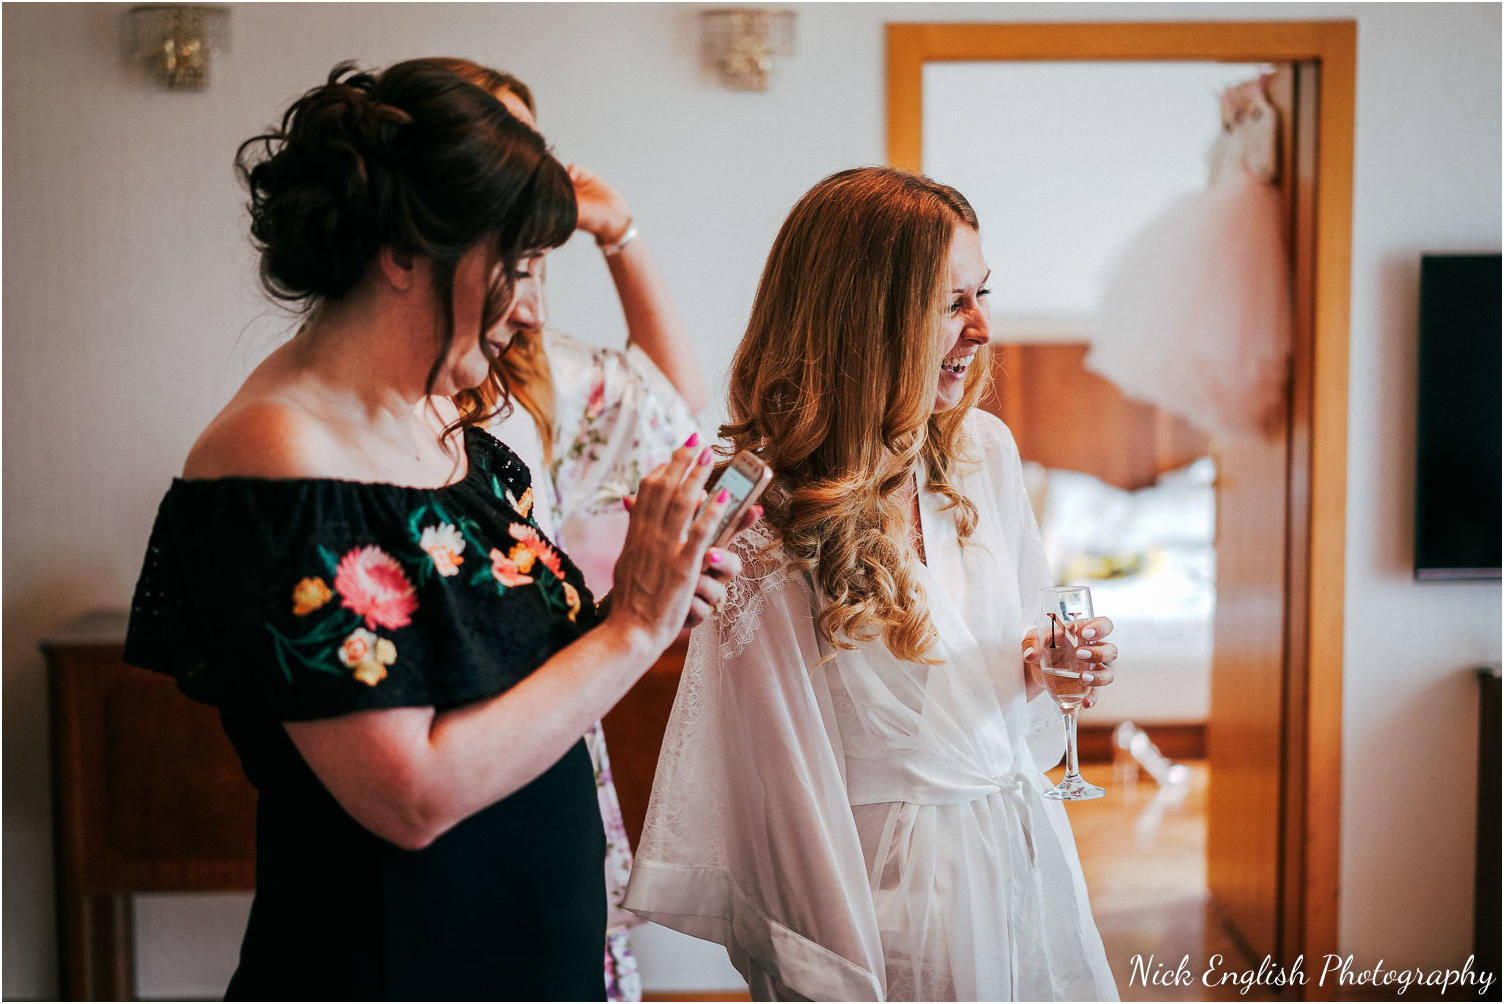 Destination_Wedding_Photographer_Slovenia_Nick_English_Photography-9.jpg